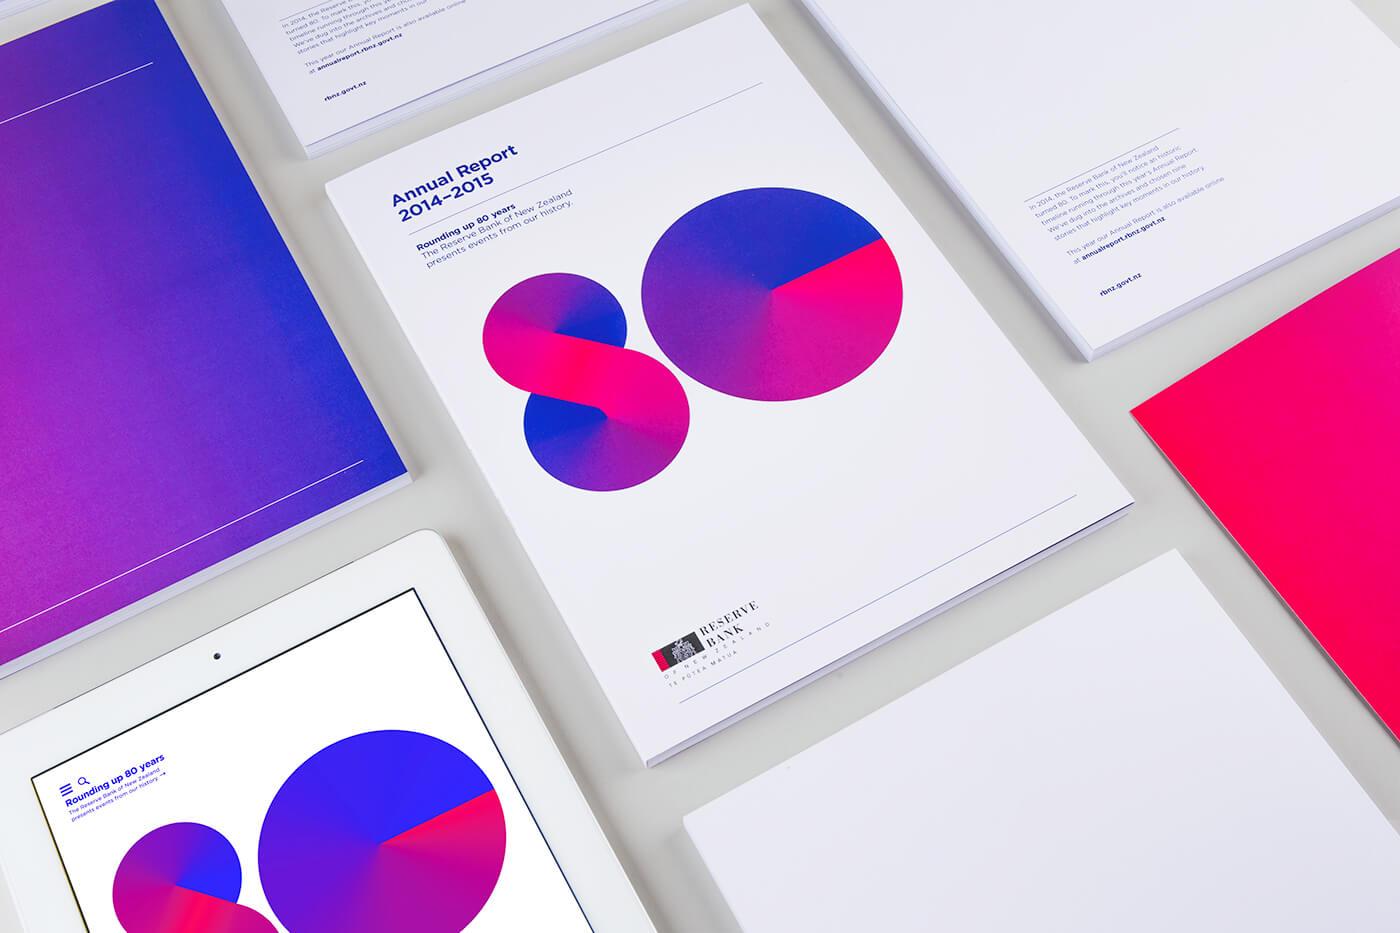 RBNZ Annual Report